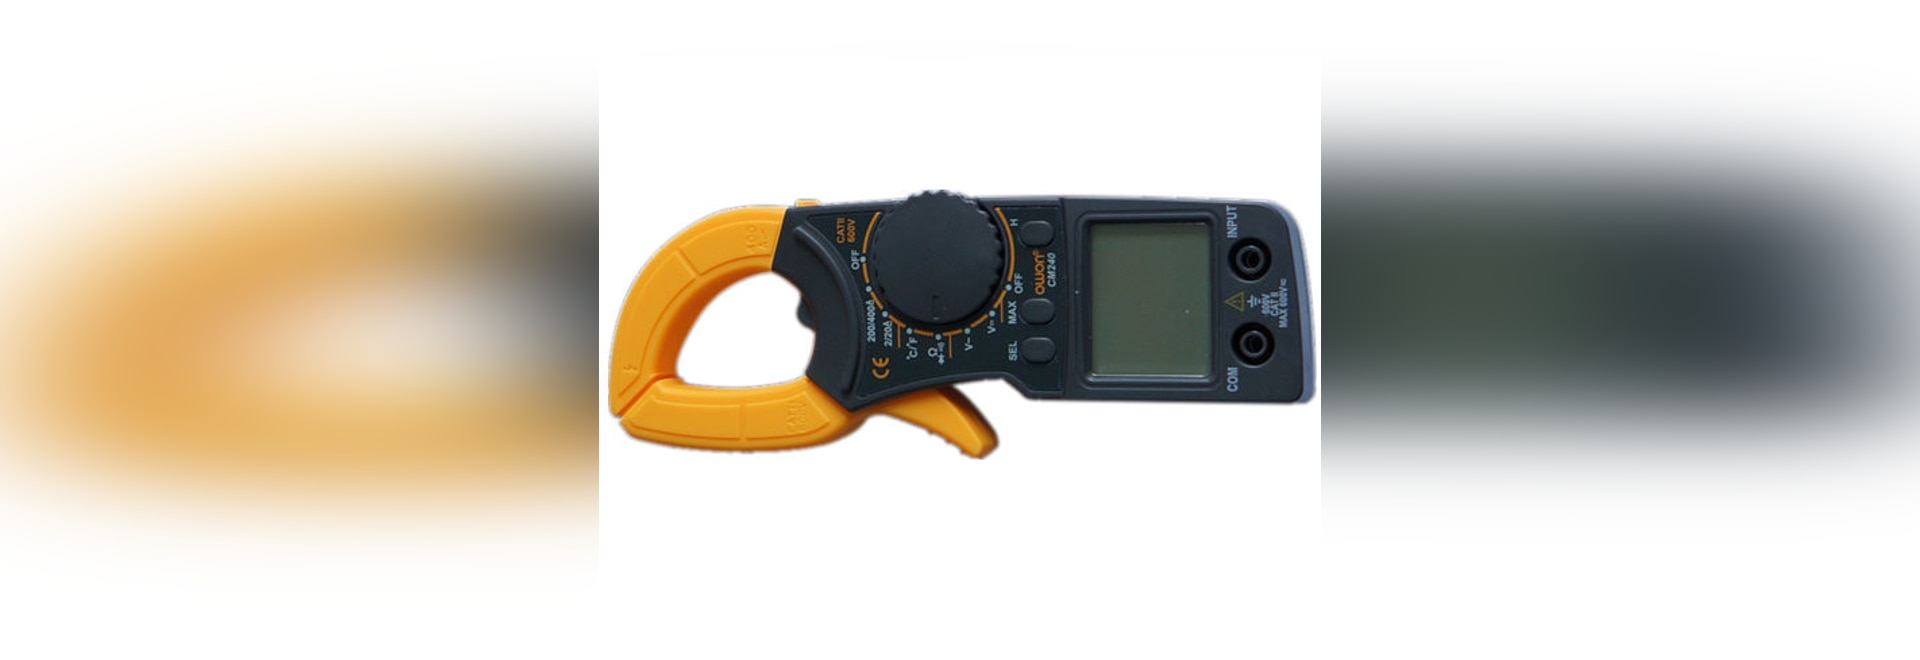 NEW: digital clamp multimeter by Fujian Lilliput Optoelectronics Technology Co., Lt